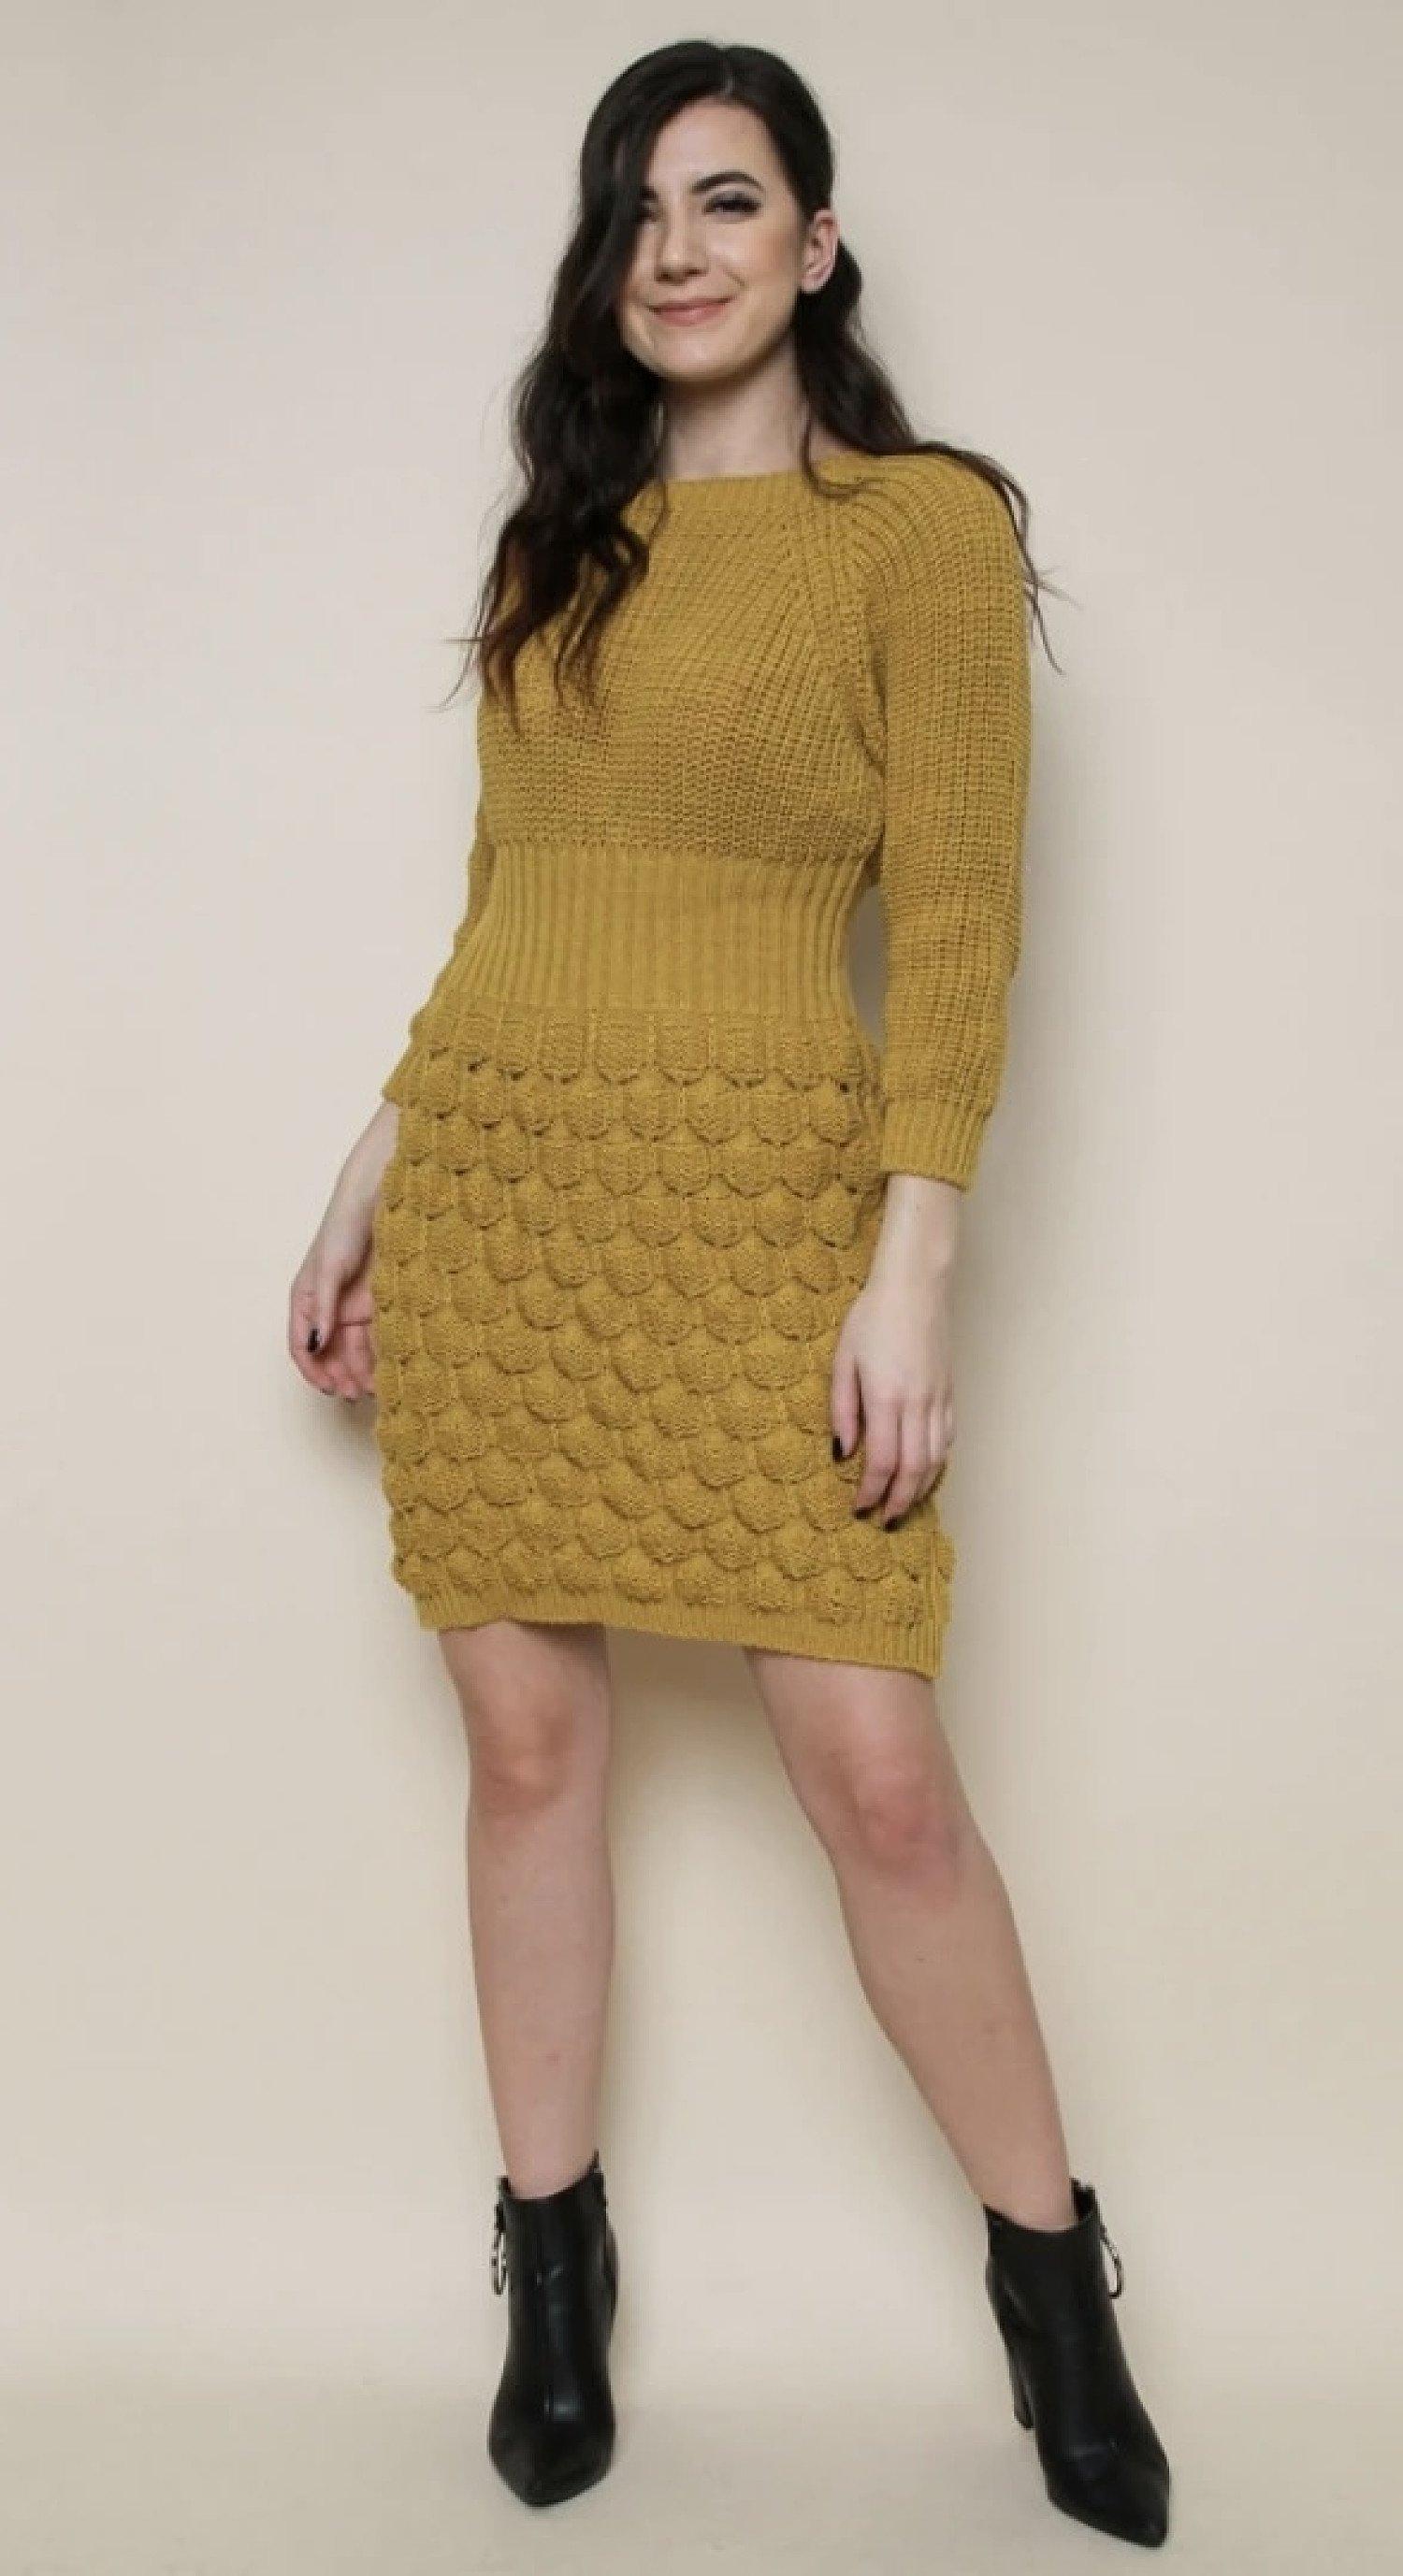 Cianna Bubble Dress - Mustard £15